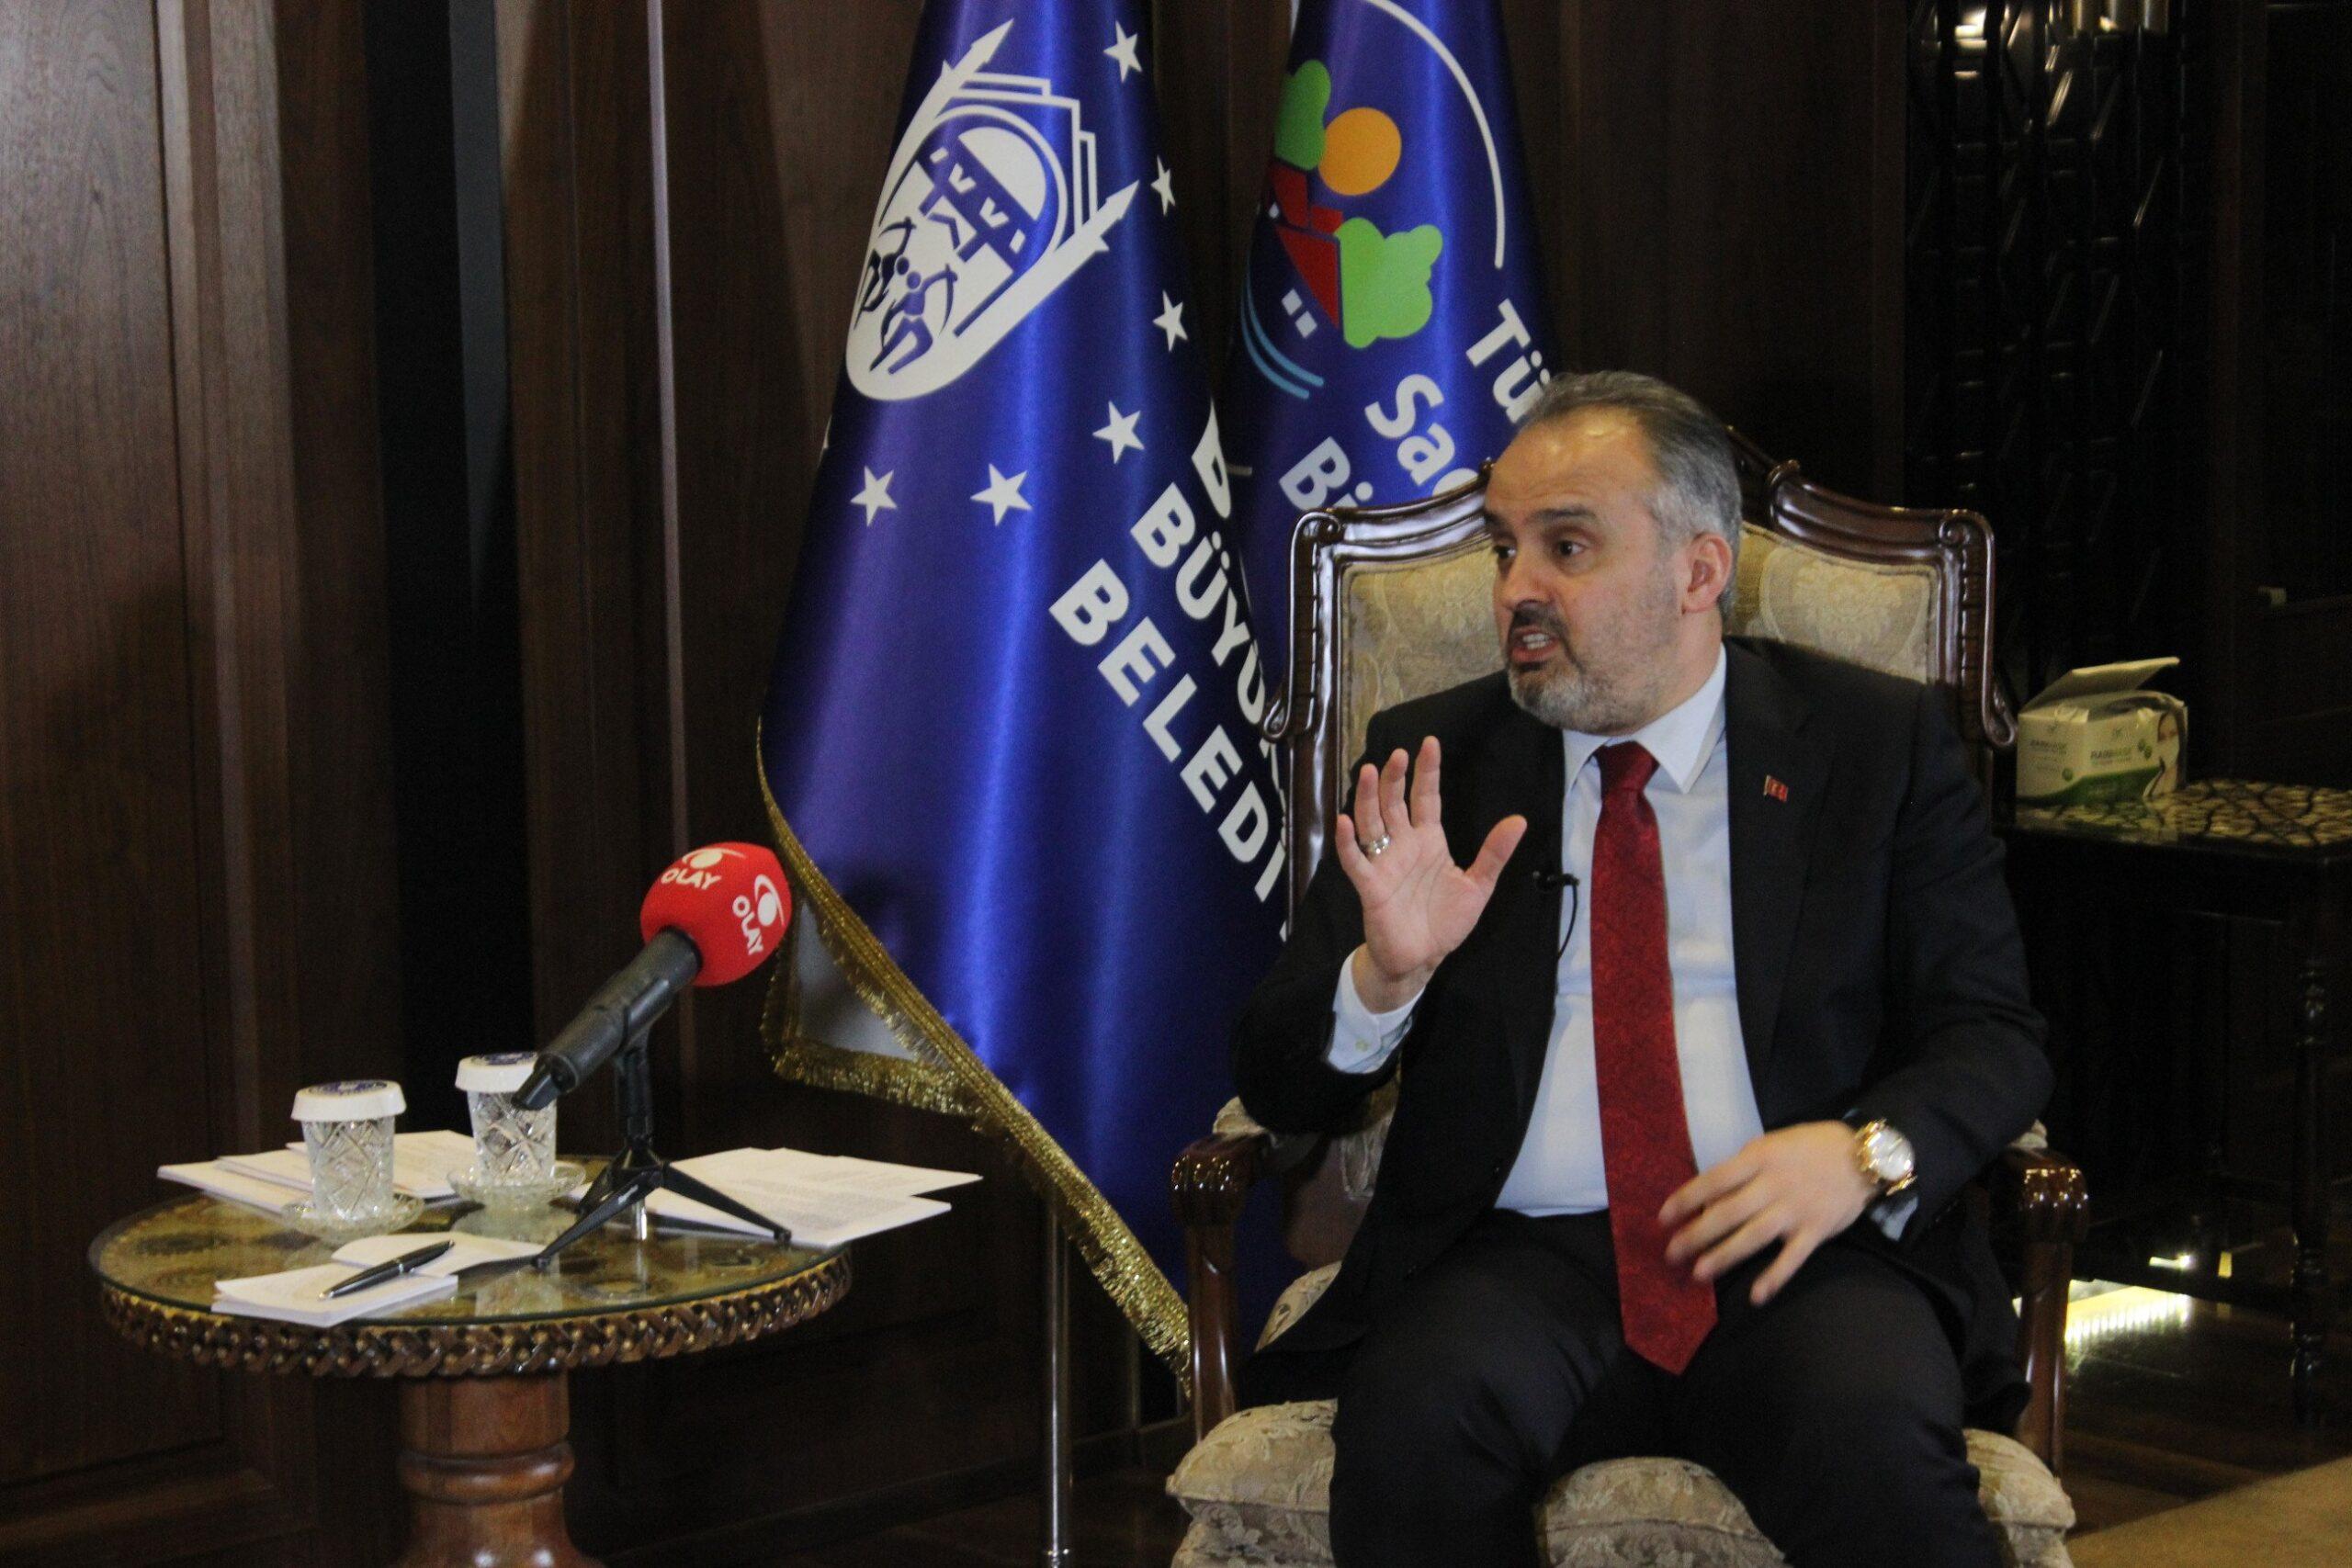 Başkan Aktaş'tan Bursa'ya 3 mesaj bir müjde! OLAY'dan ses getirecek röportaj…